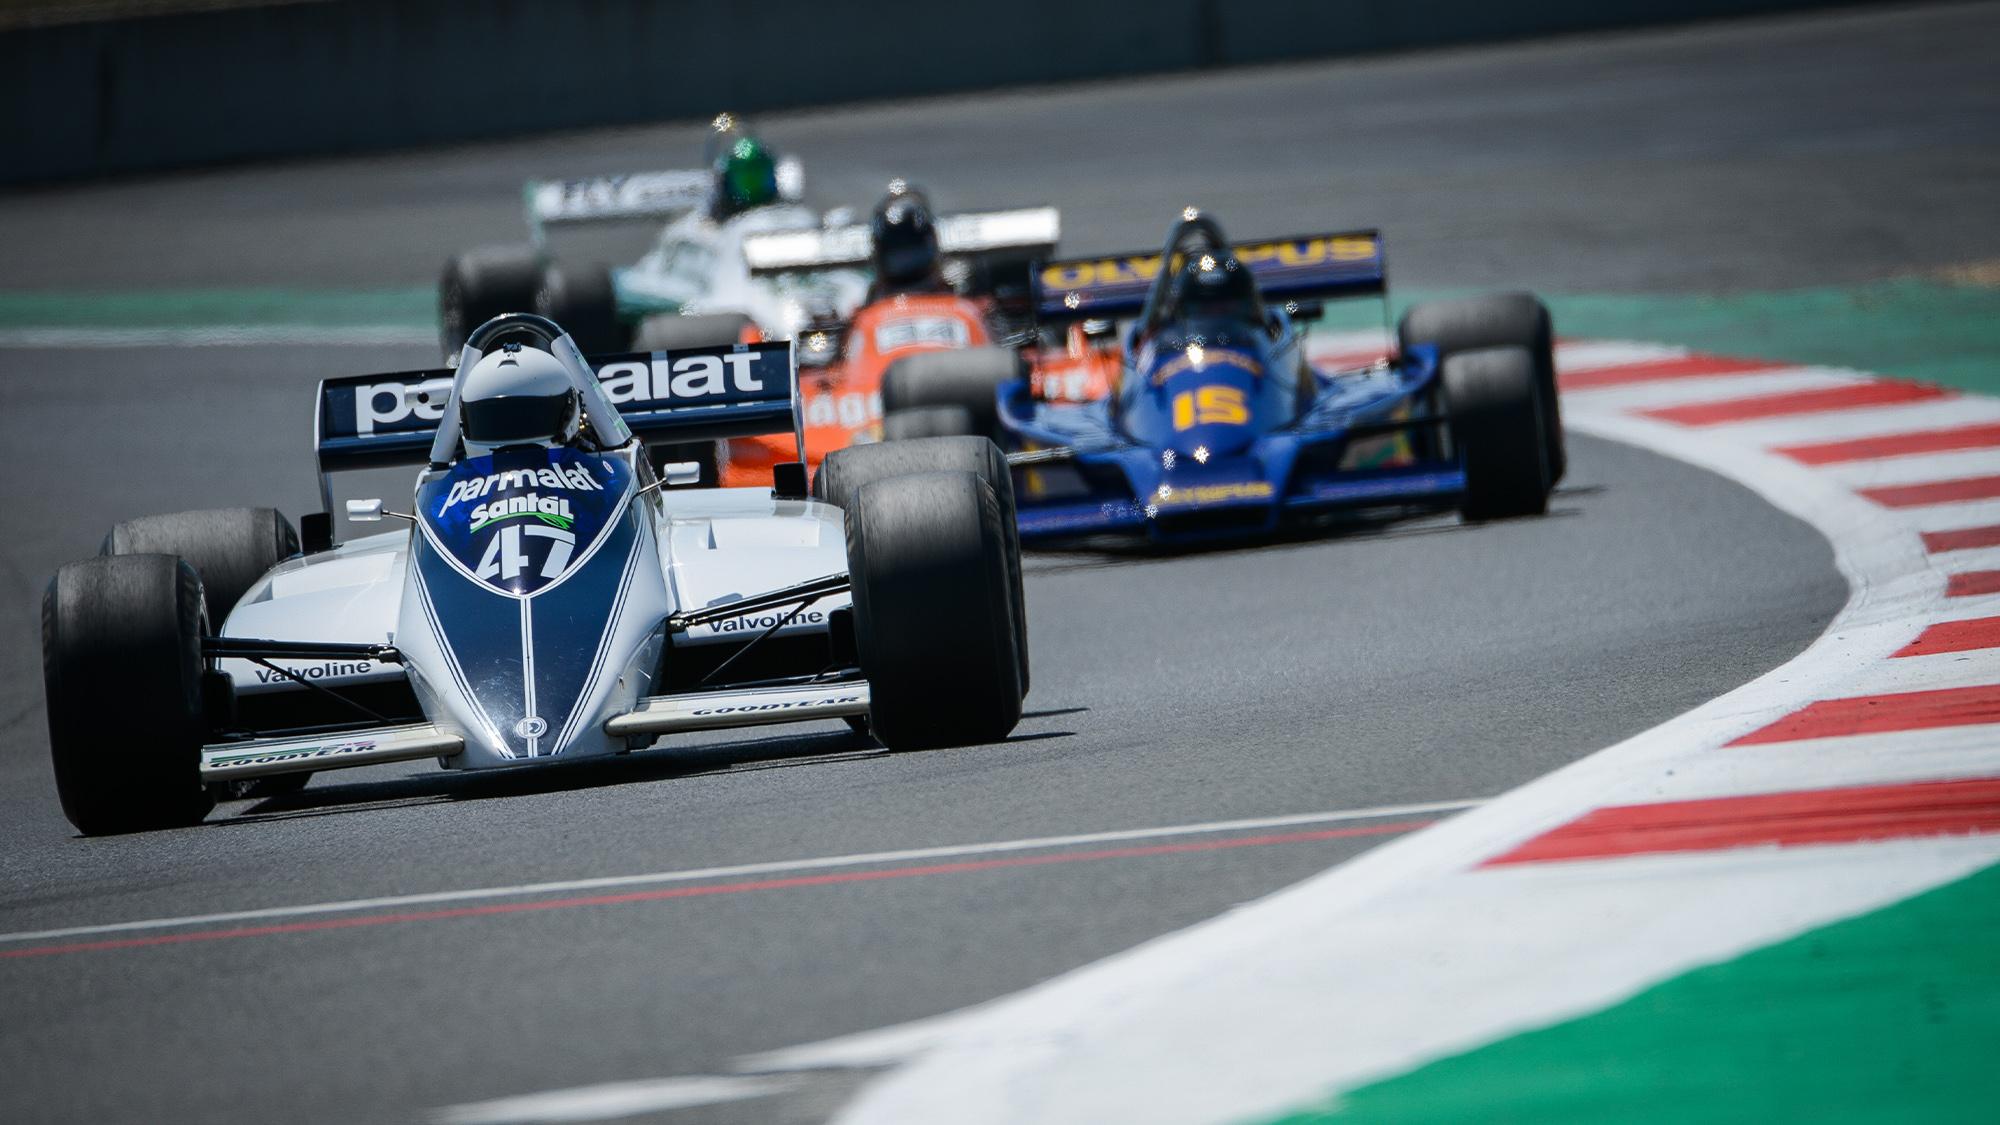 2019 Historic French Grand Prix